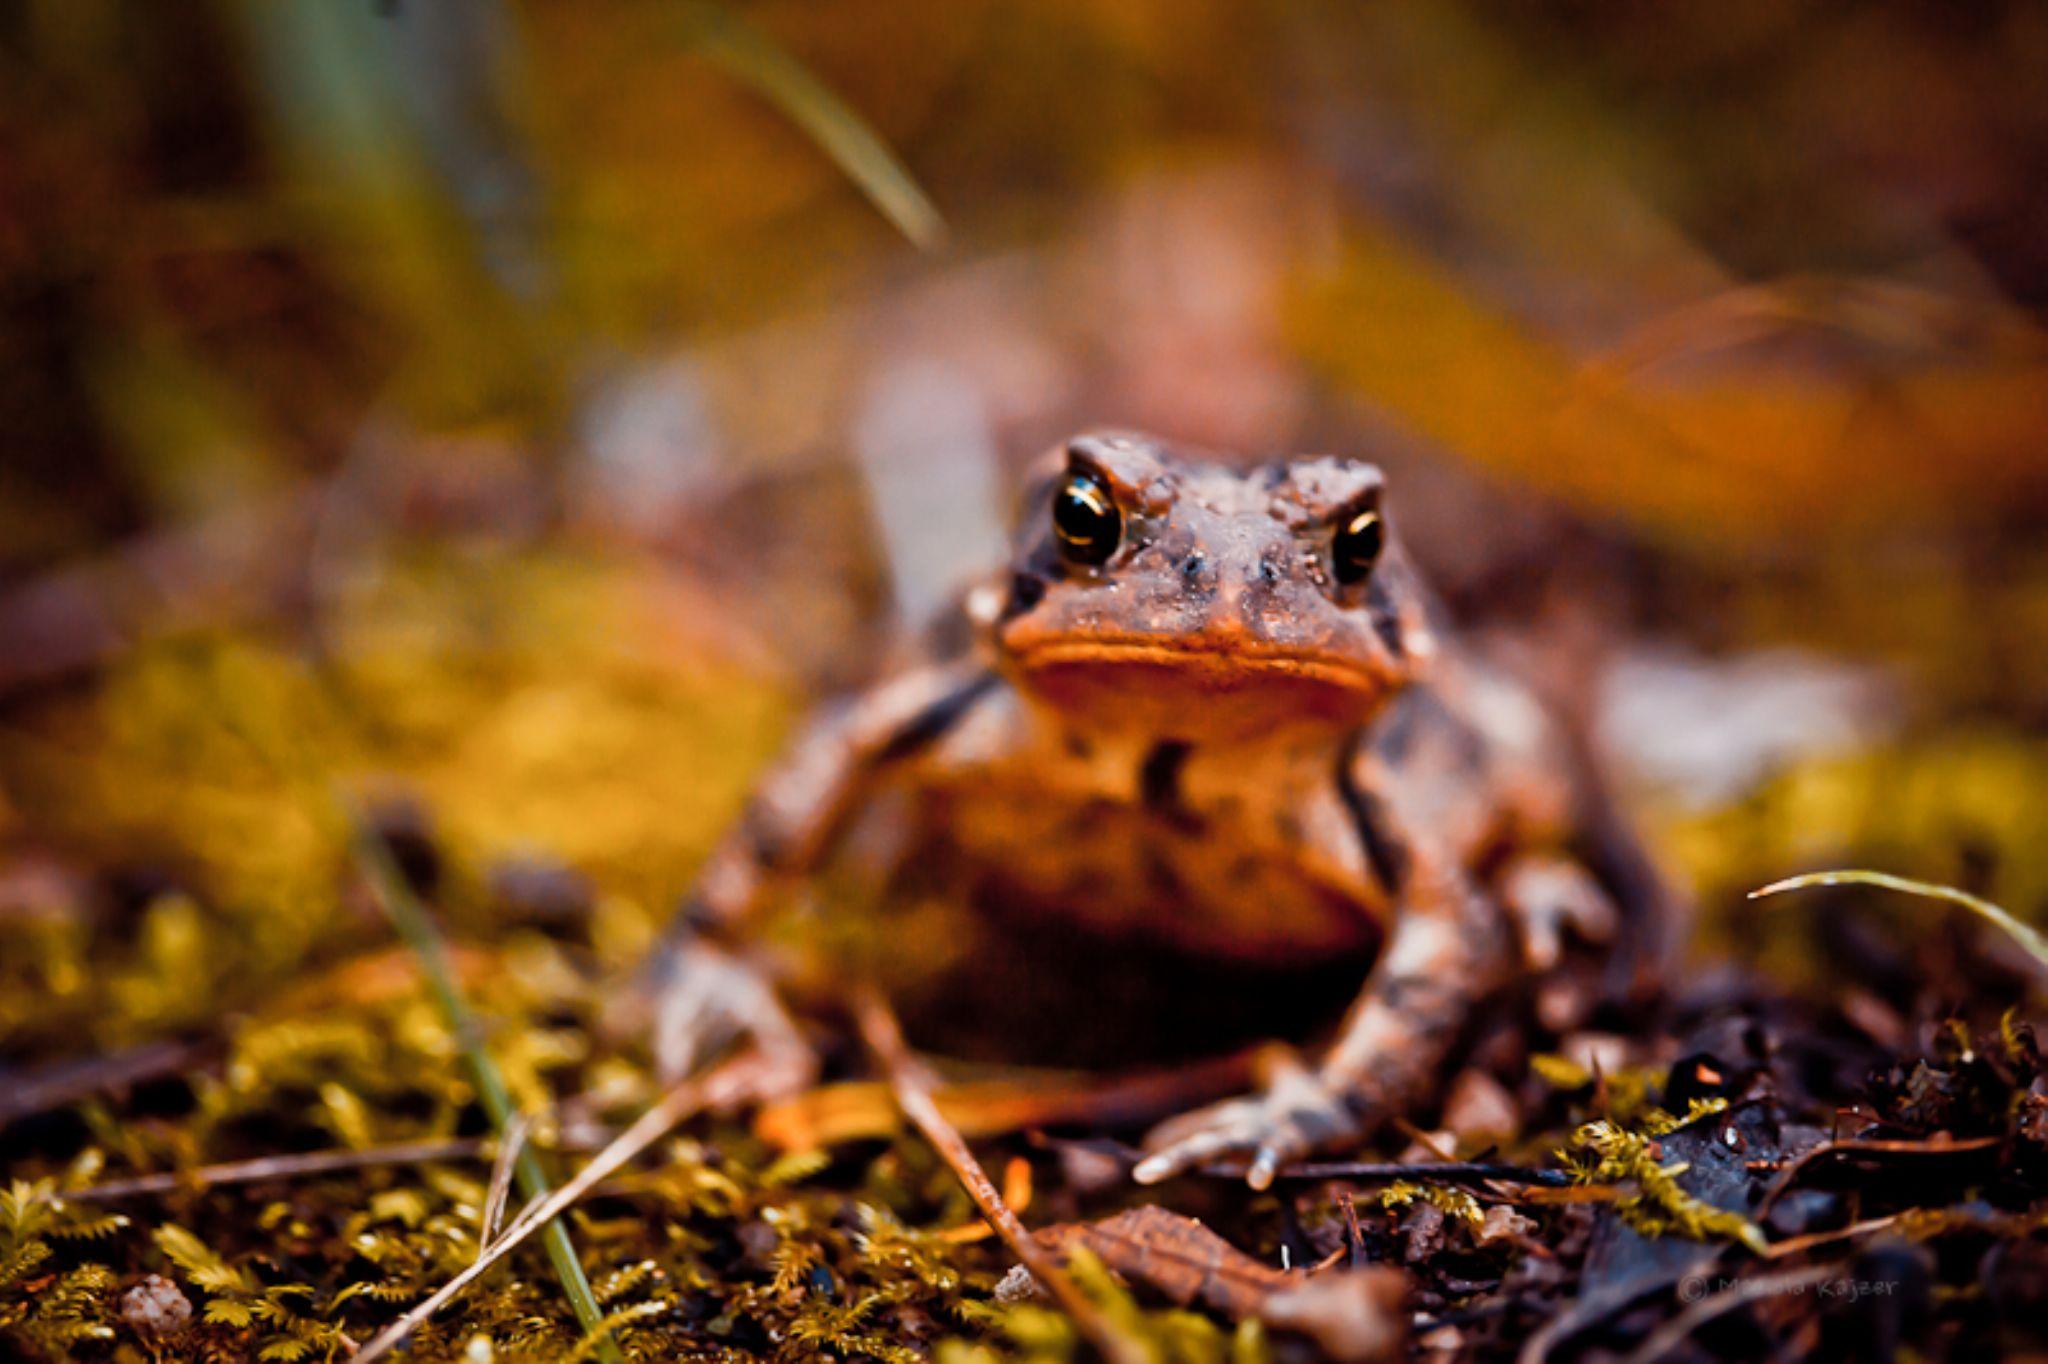 orange toad by mariola.kajzer.1